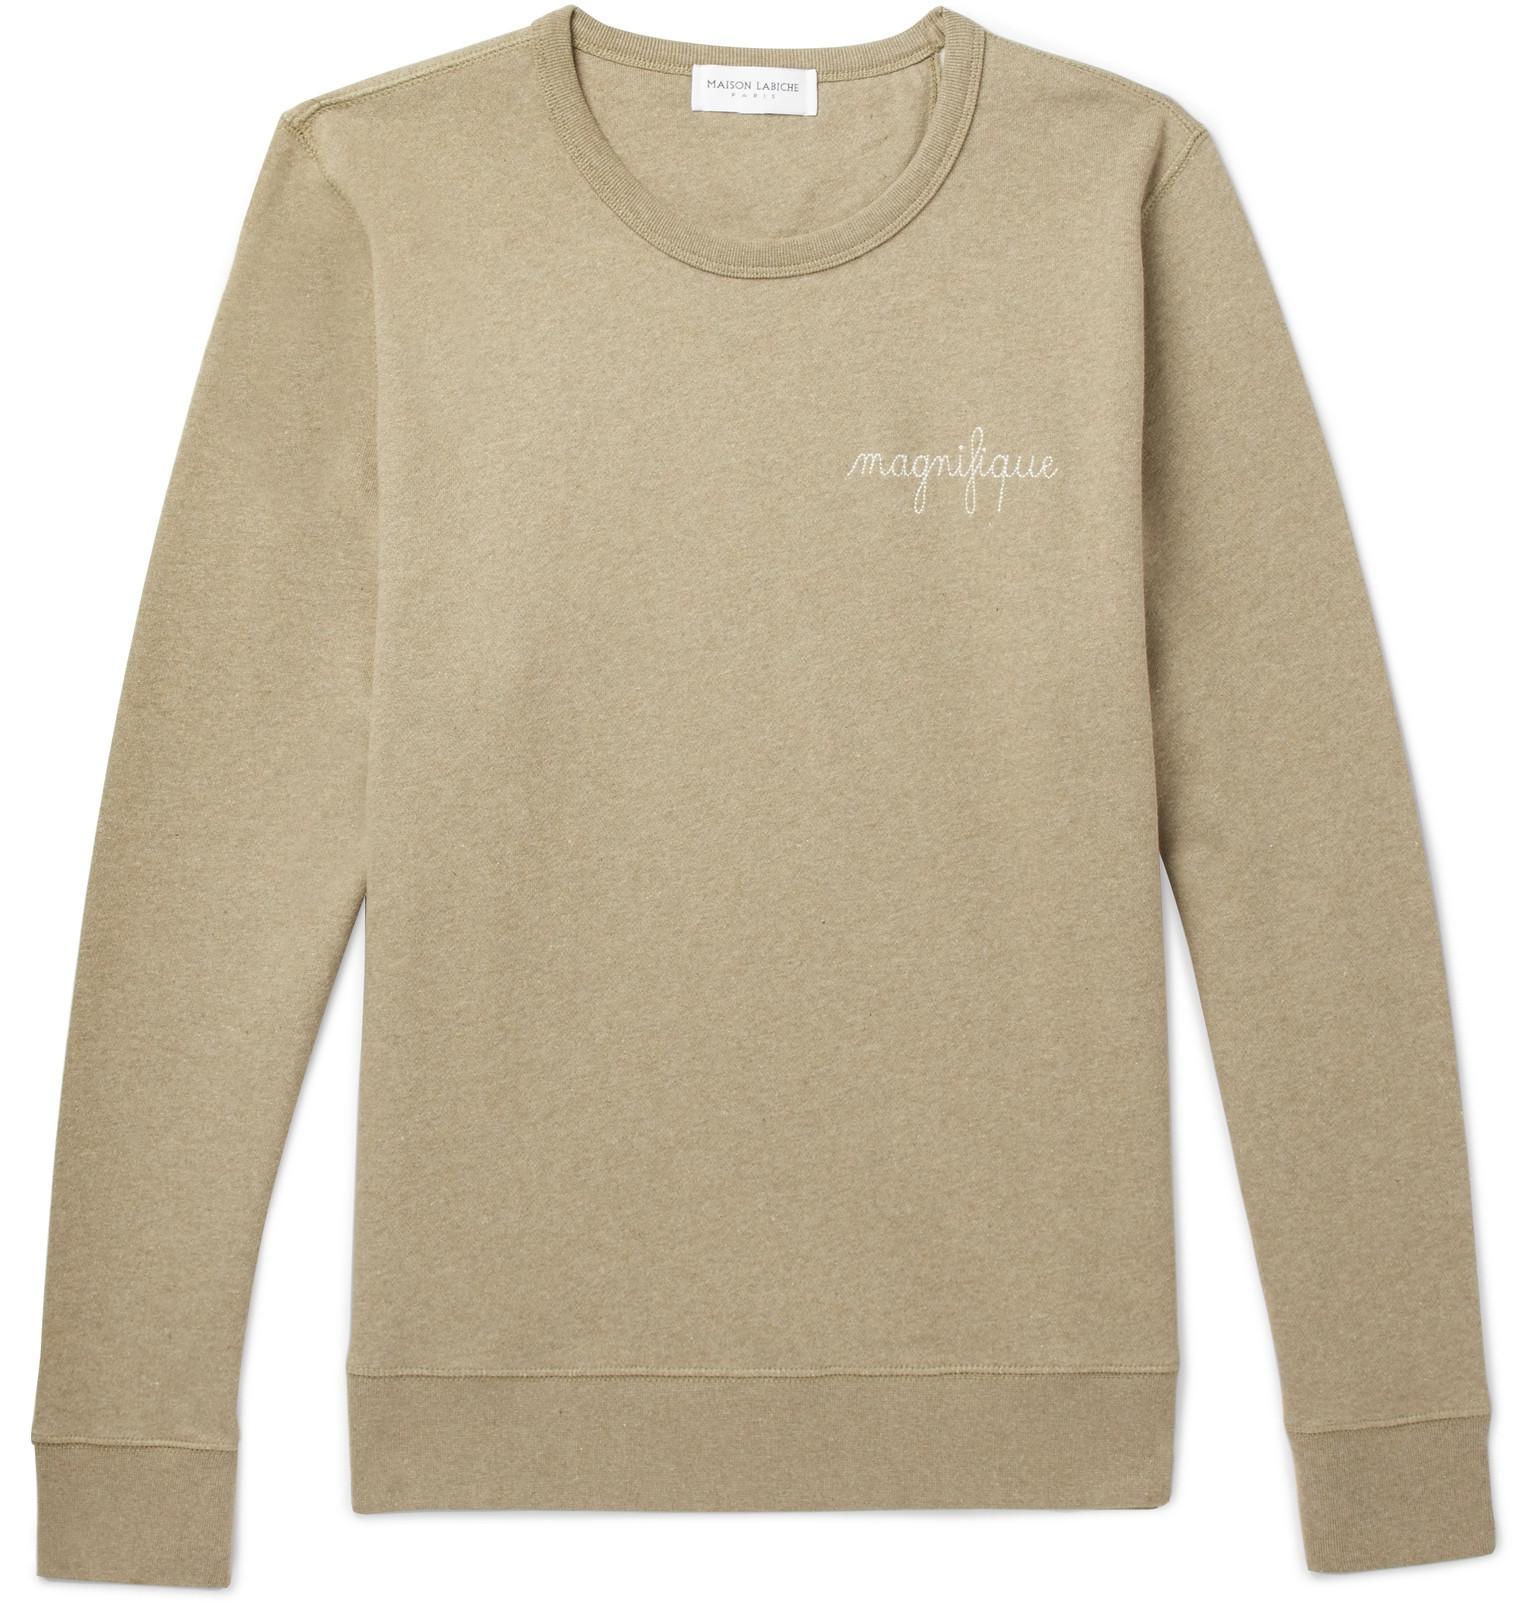 Maison Labiche Embroidered Fleece-back Cotton-jersey Sweatshirt - Green 9WG6PwvB